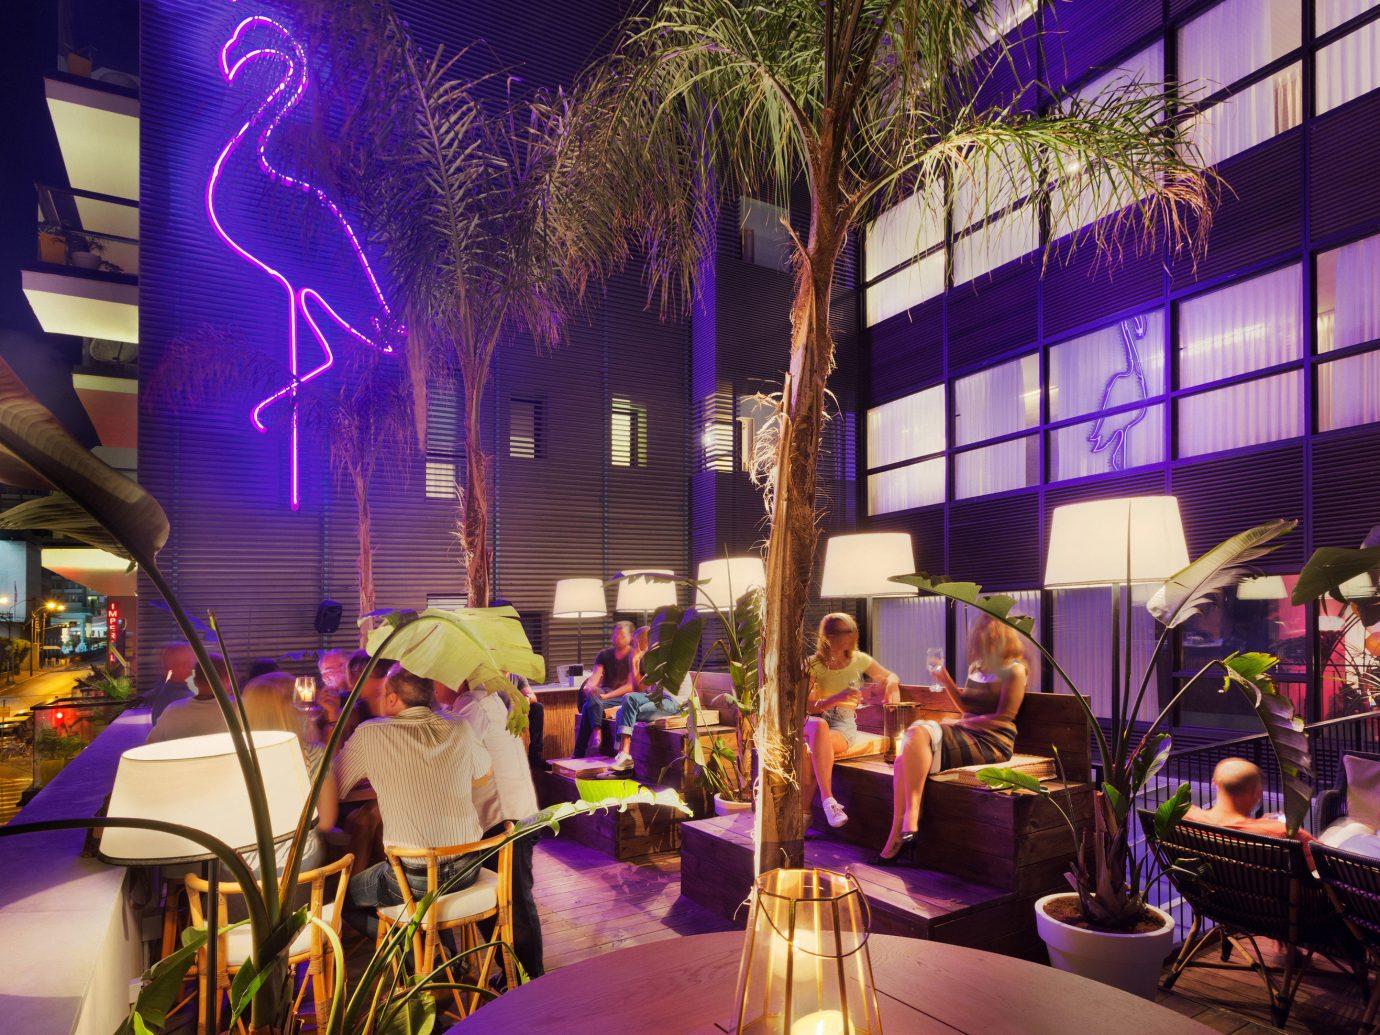 Boutique Hotels Festivals + Events Hotels Trip Ideas meal restaurant function hall Resort